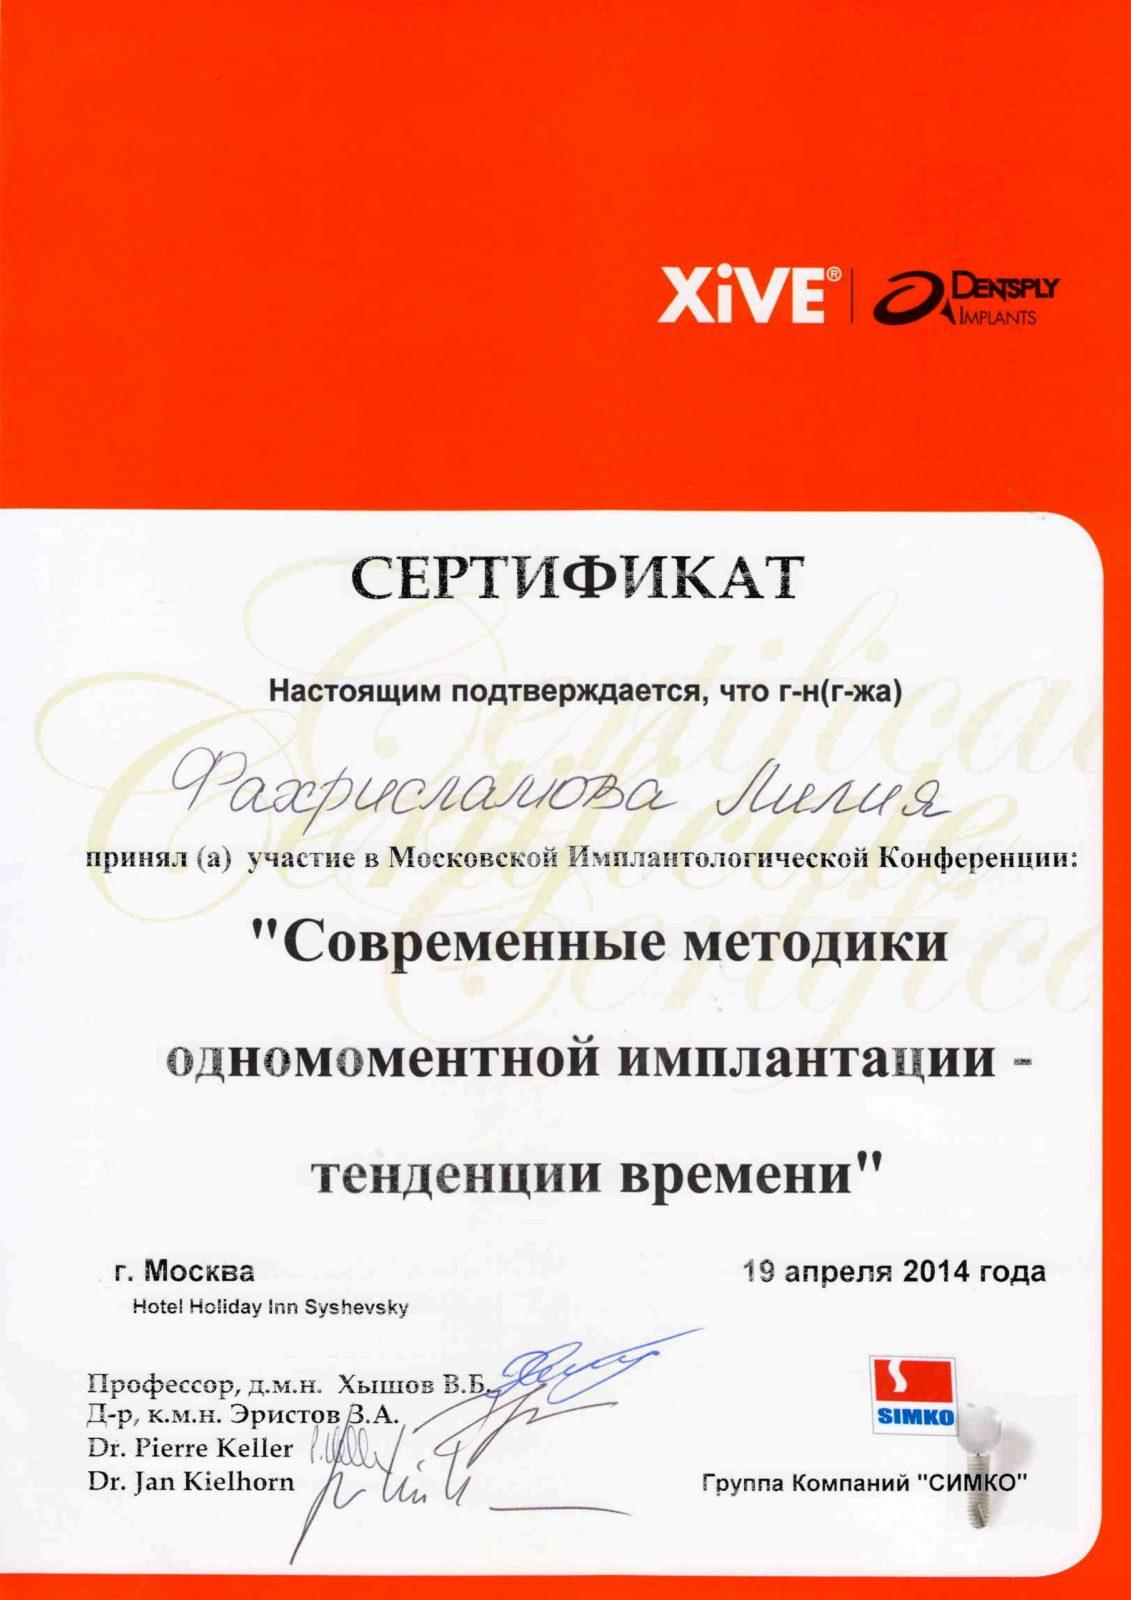 http://oris-vidnoe.ru/wp-content/uploads/2021/05/2-scaled.jpeg